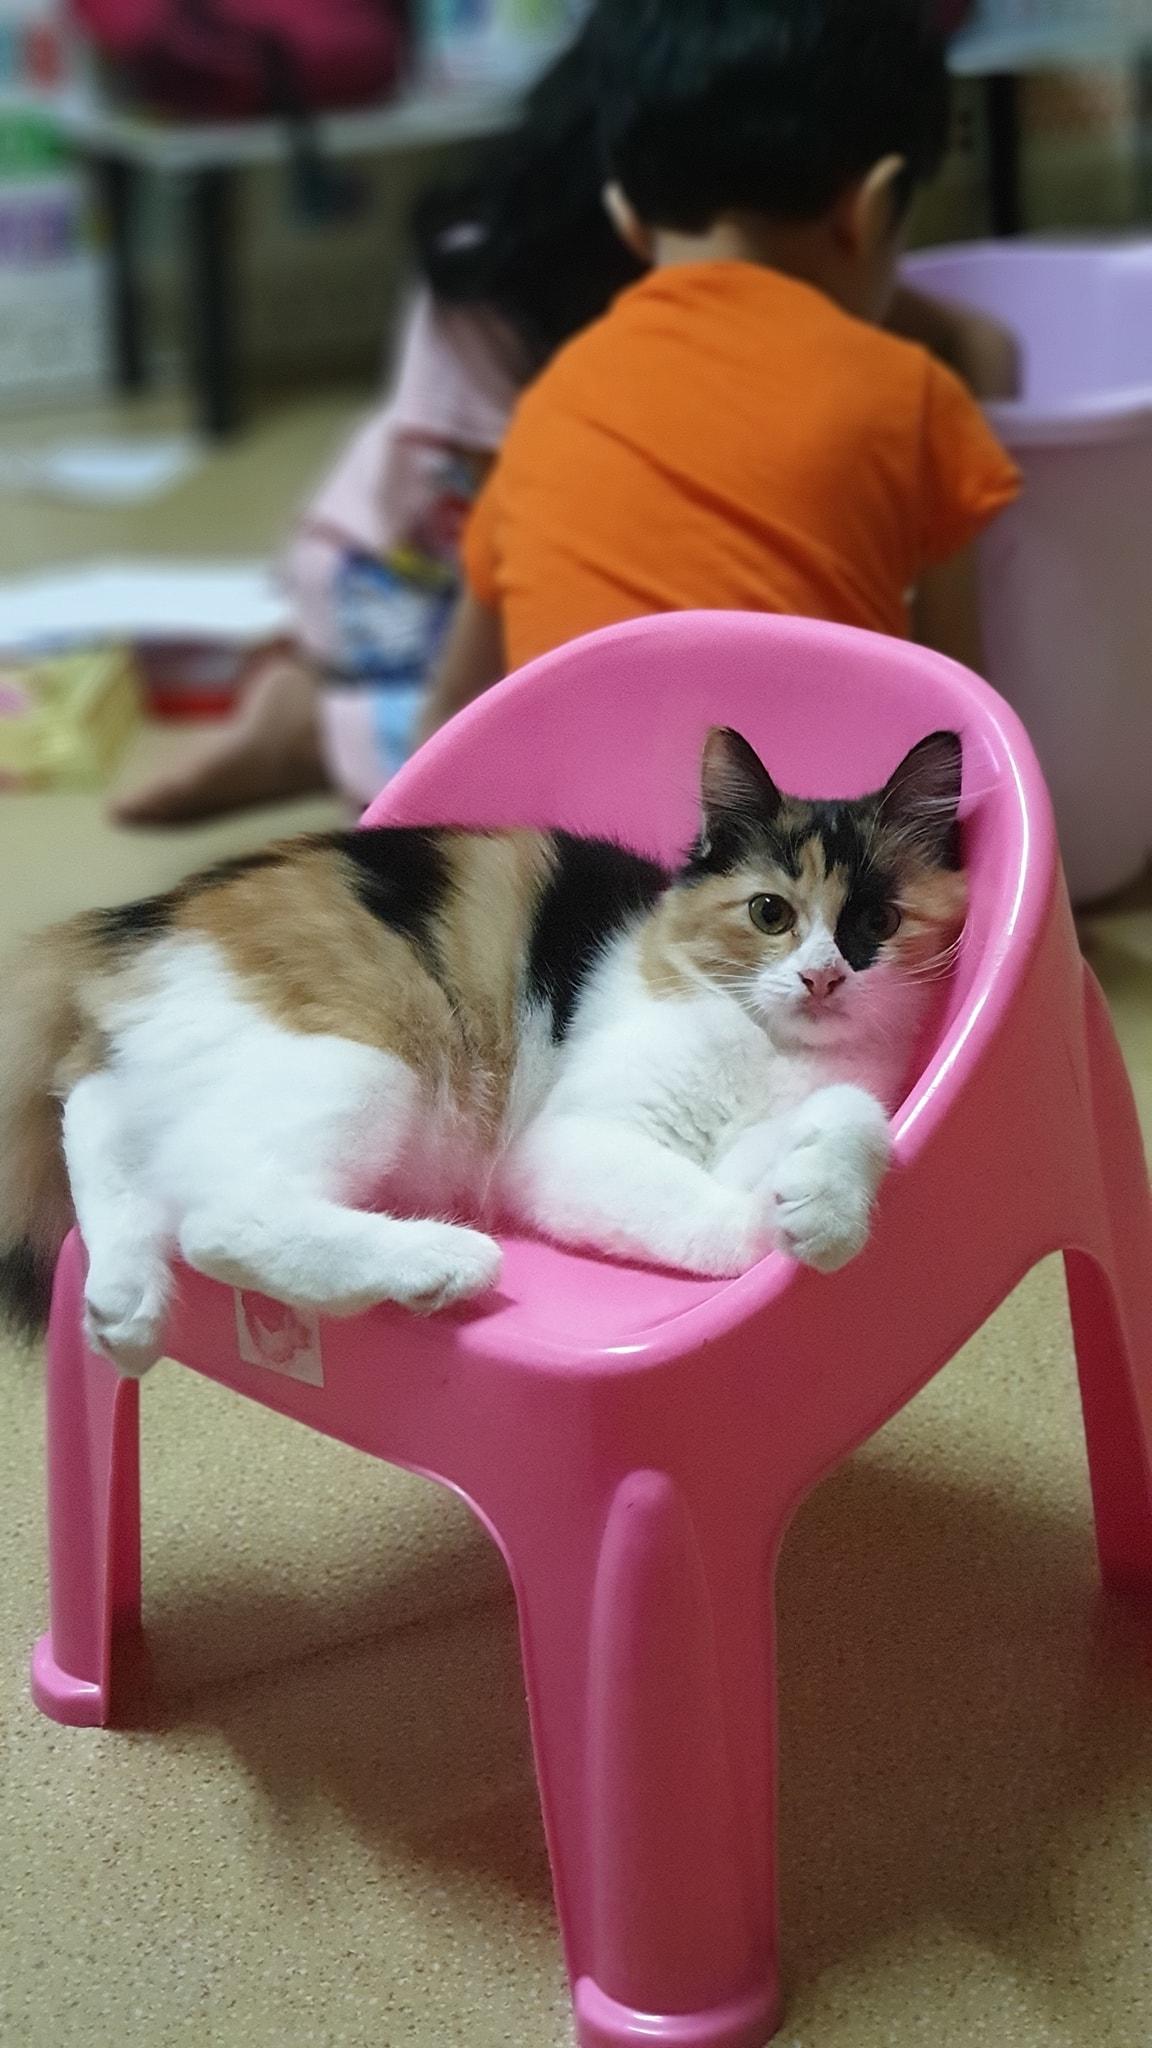 kucingbatman.jpg